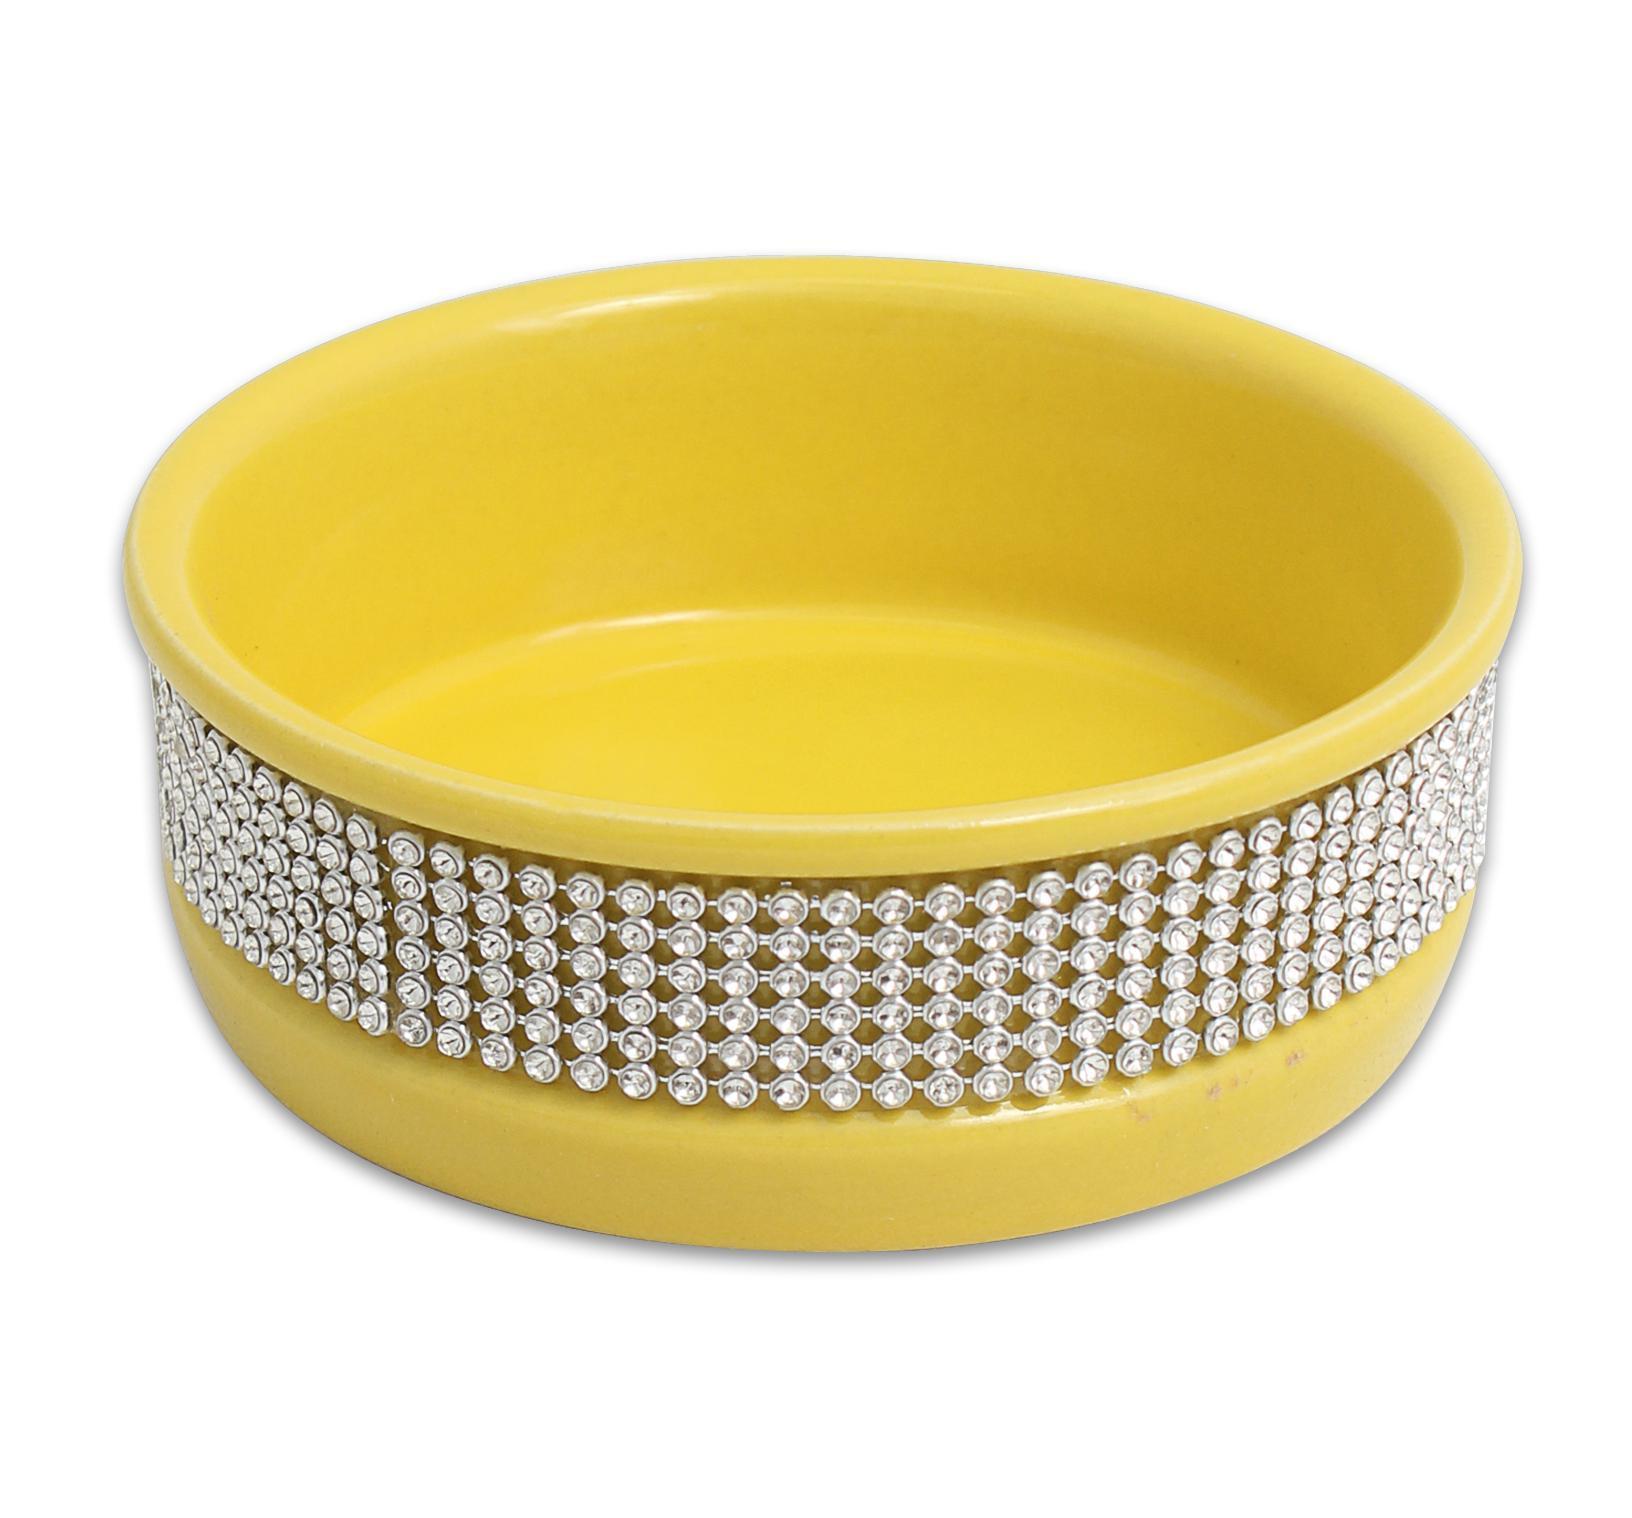 Cat Dog Pet Bowl 4 5 Quot Yellow Cute Paws Diamond Stone Dish